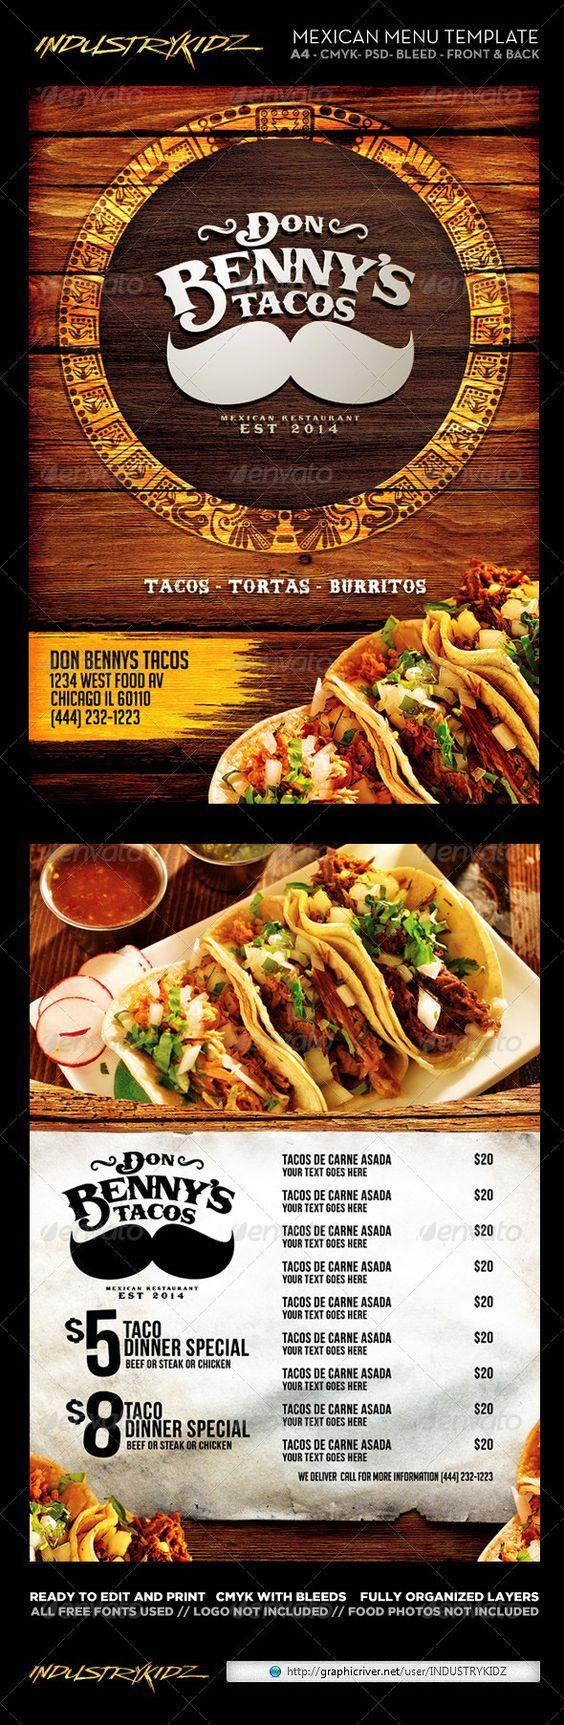 Mexican Menu Template: